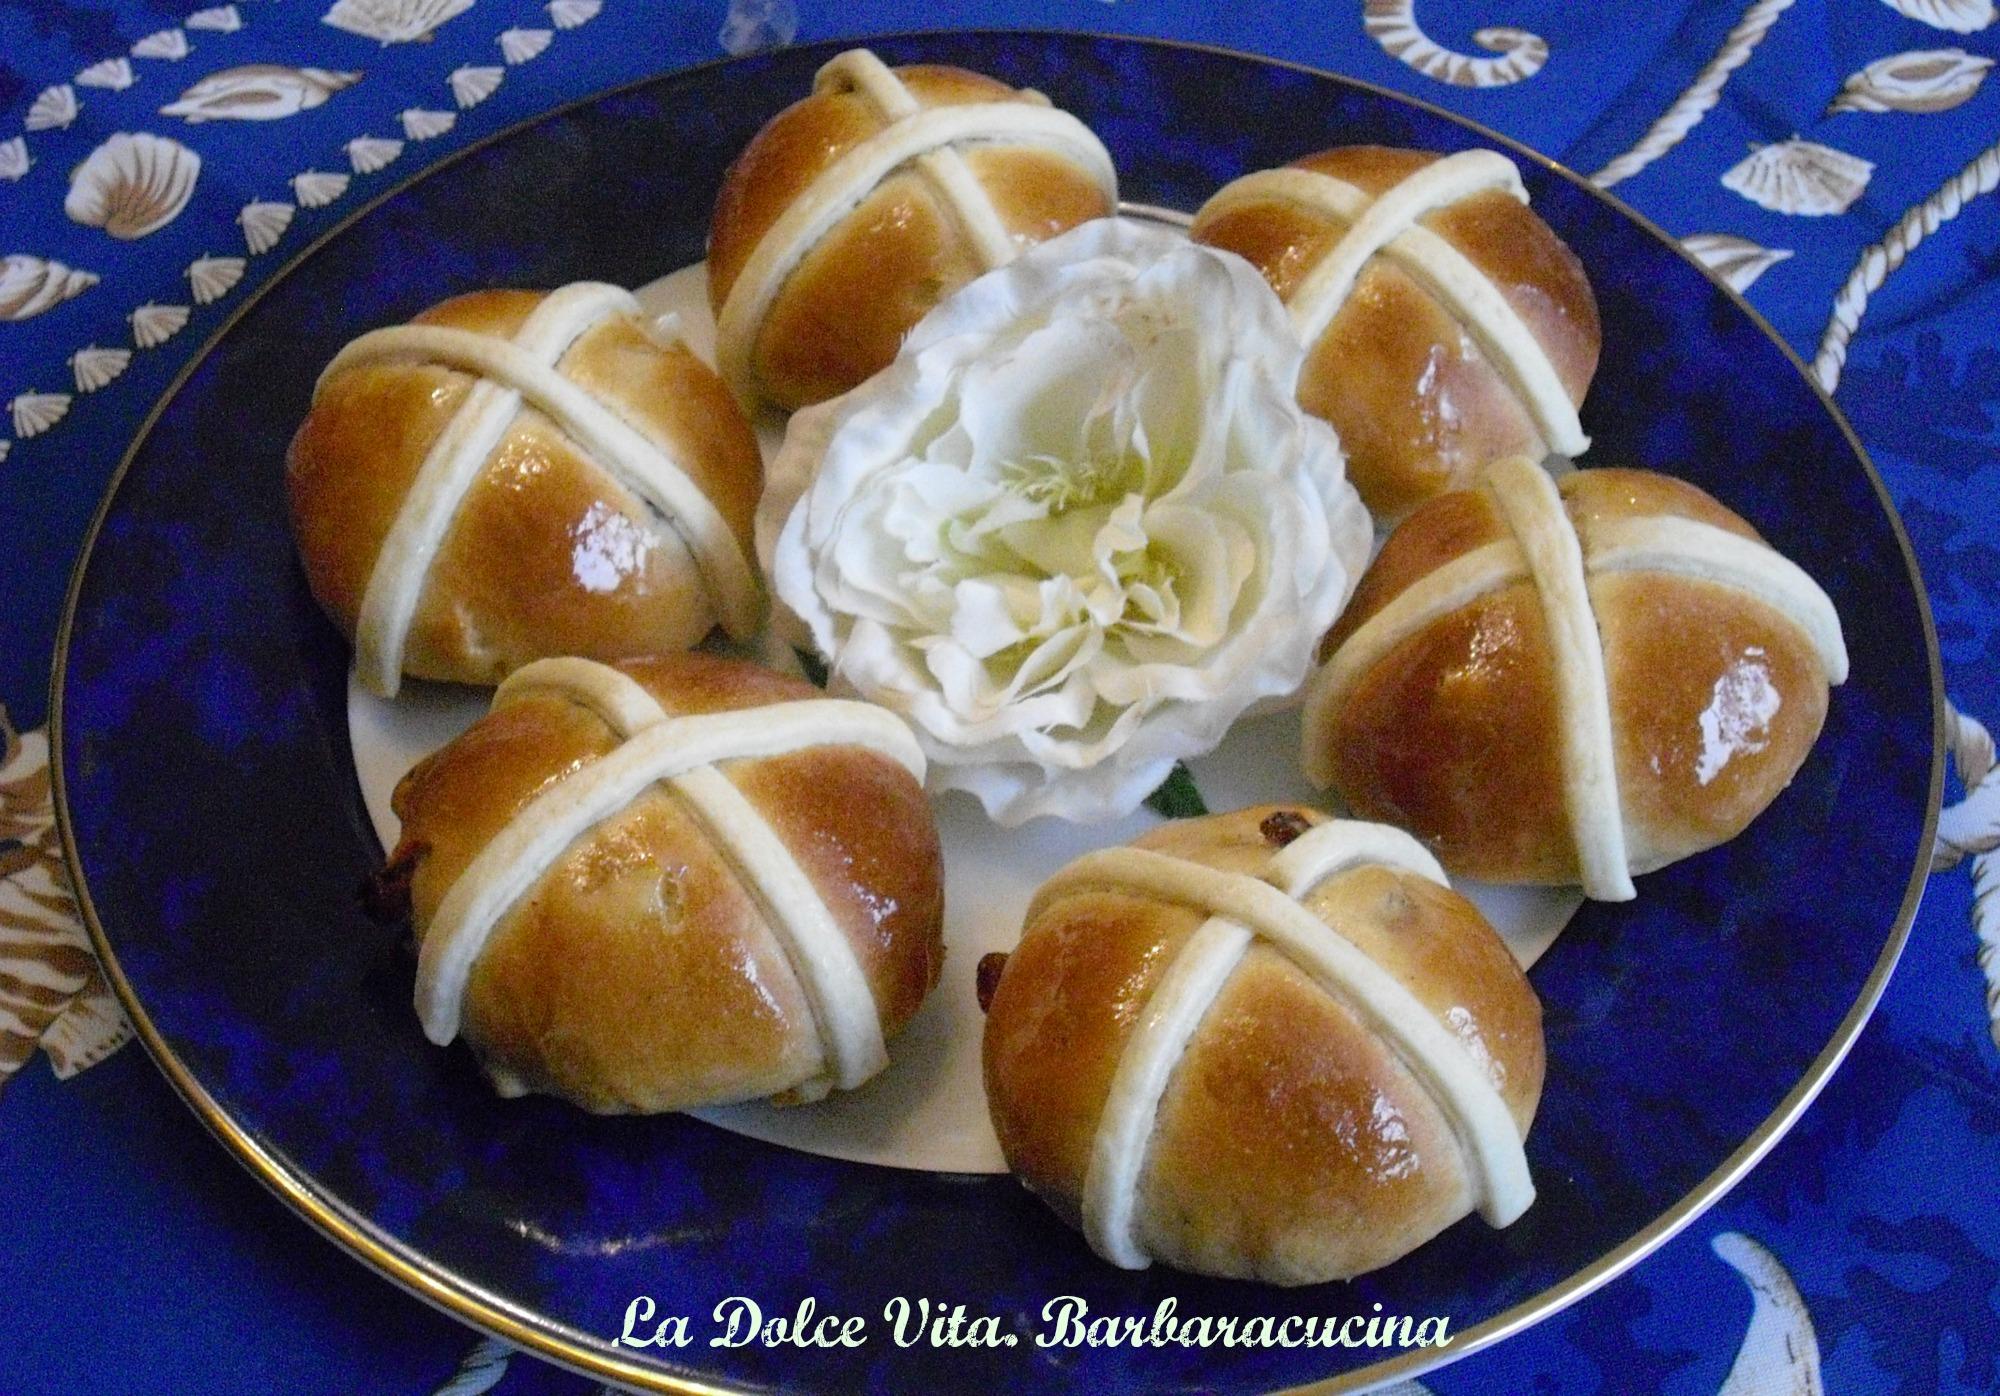 Hot cross buns solo - 1 9